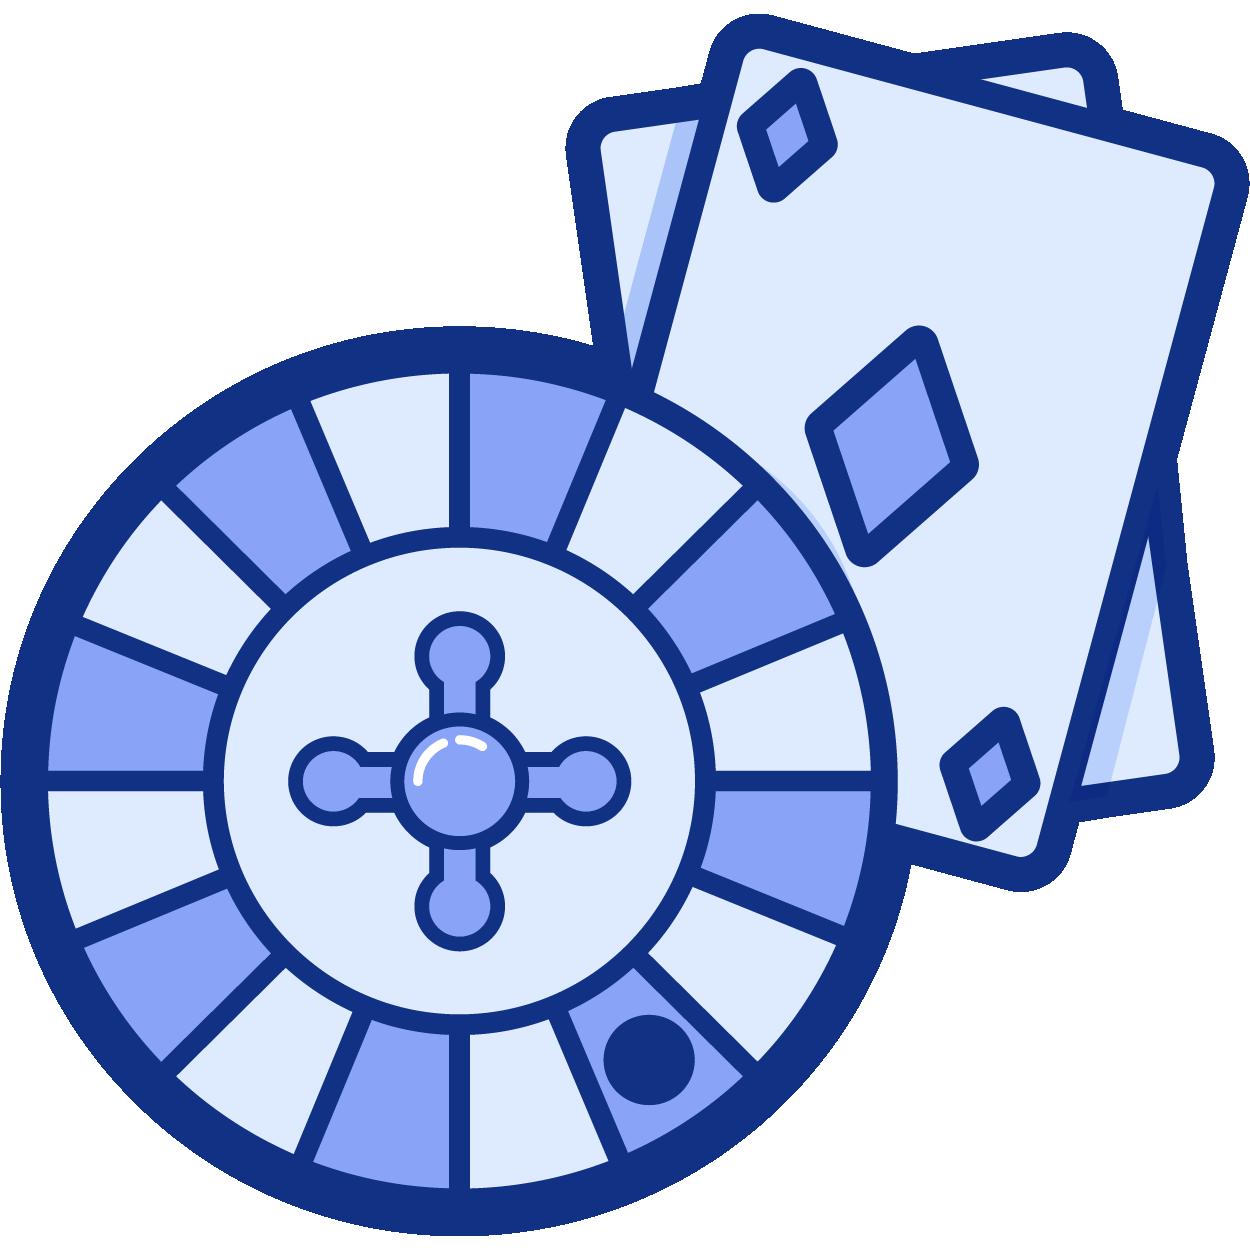 Spielesortiment icon